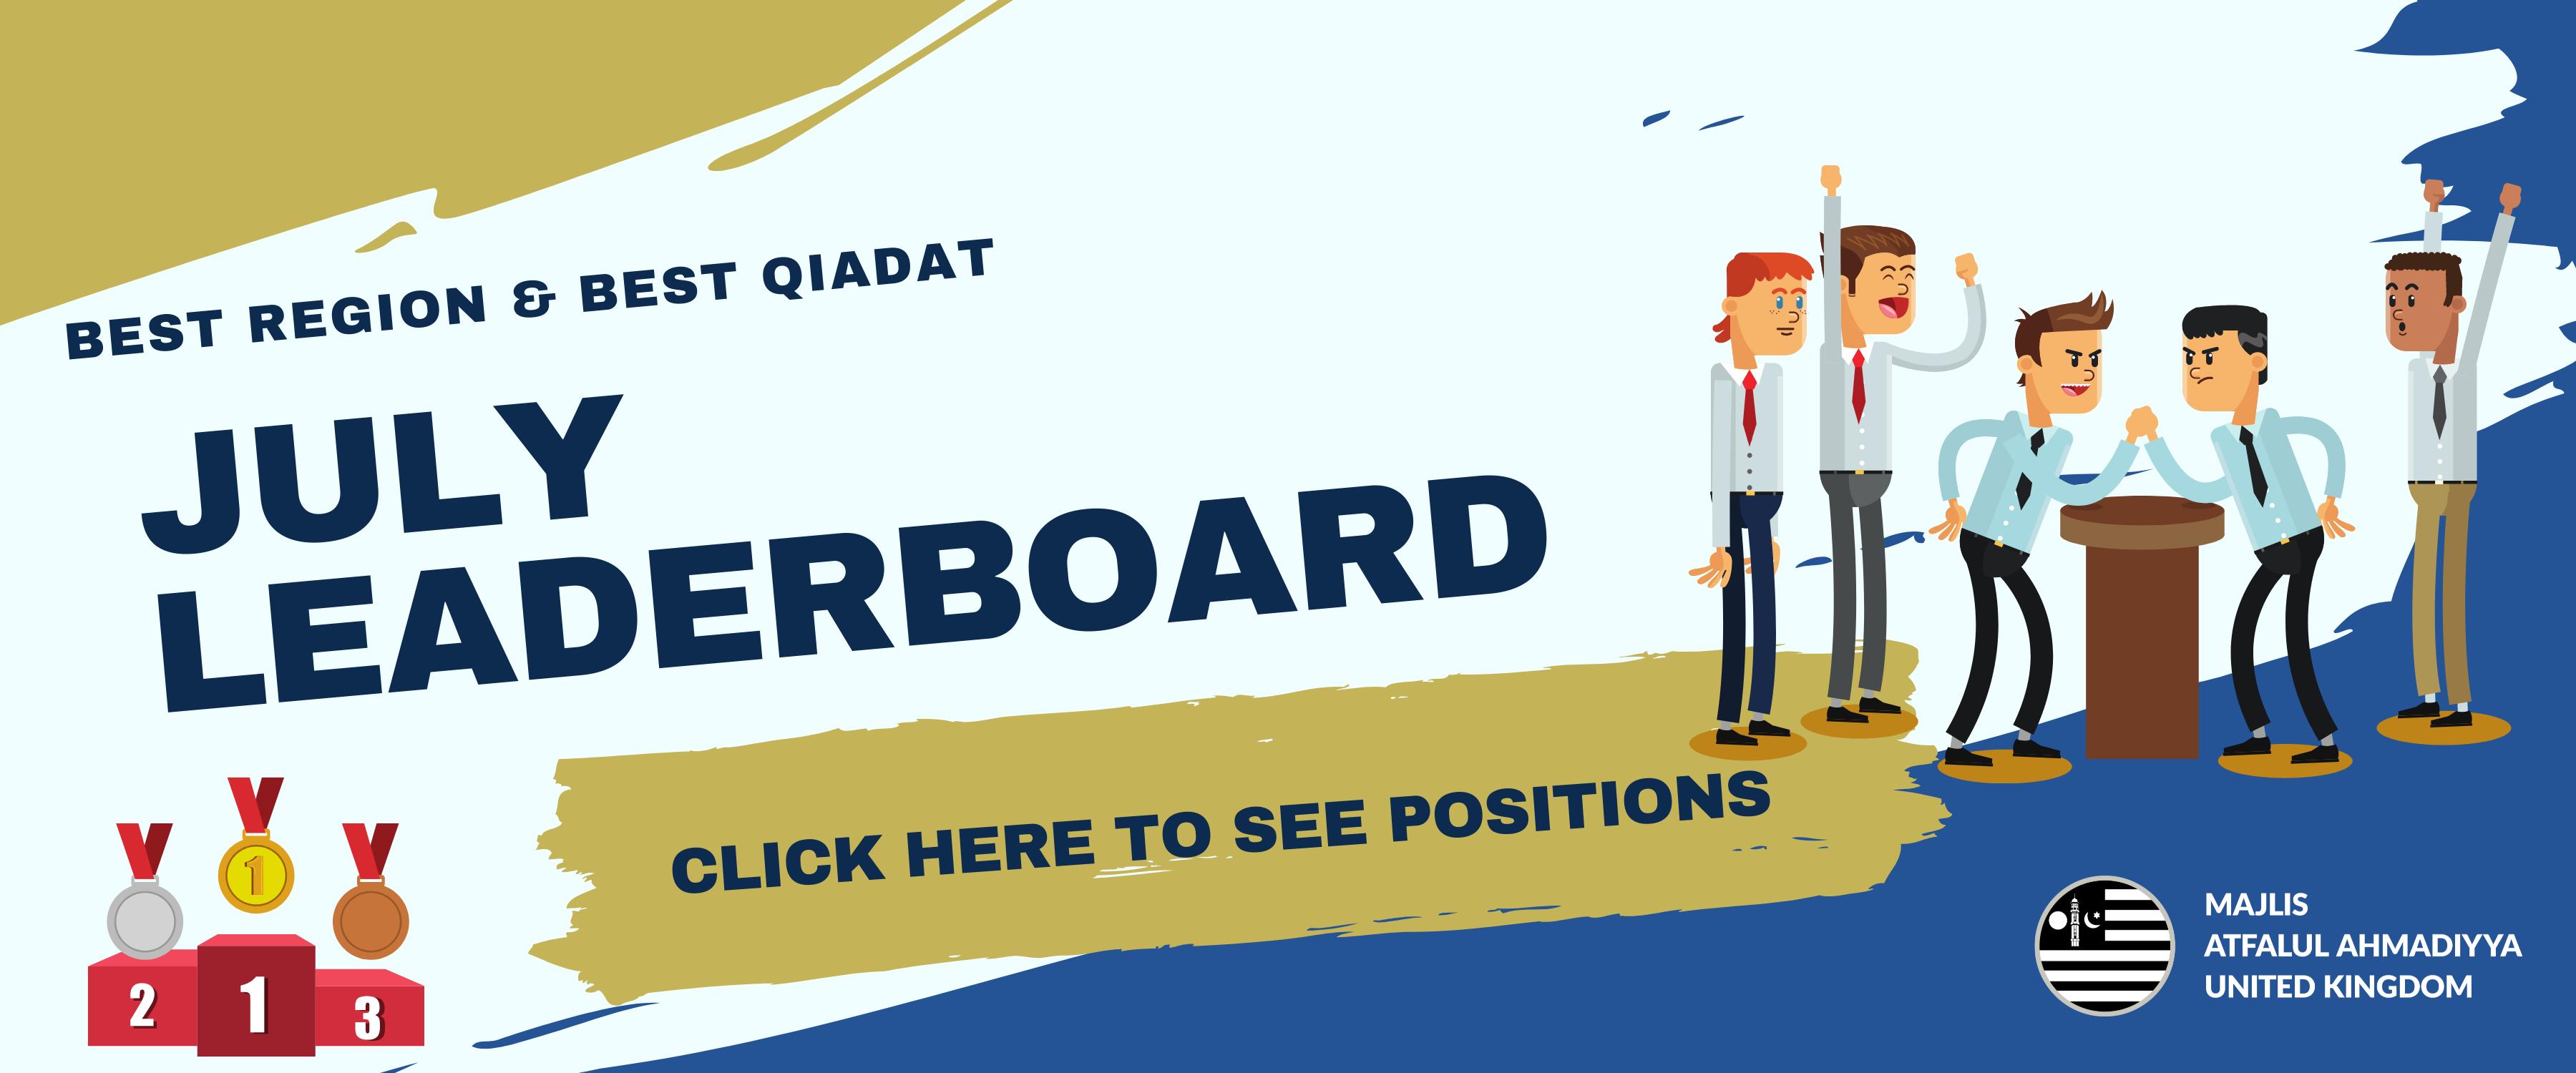 July-Leaderboard